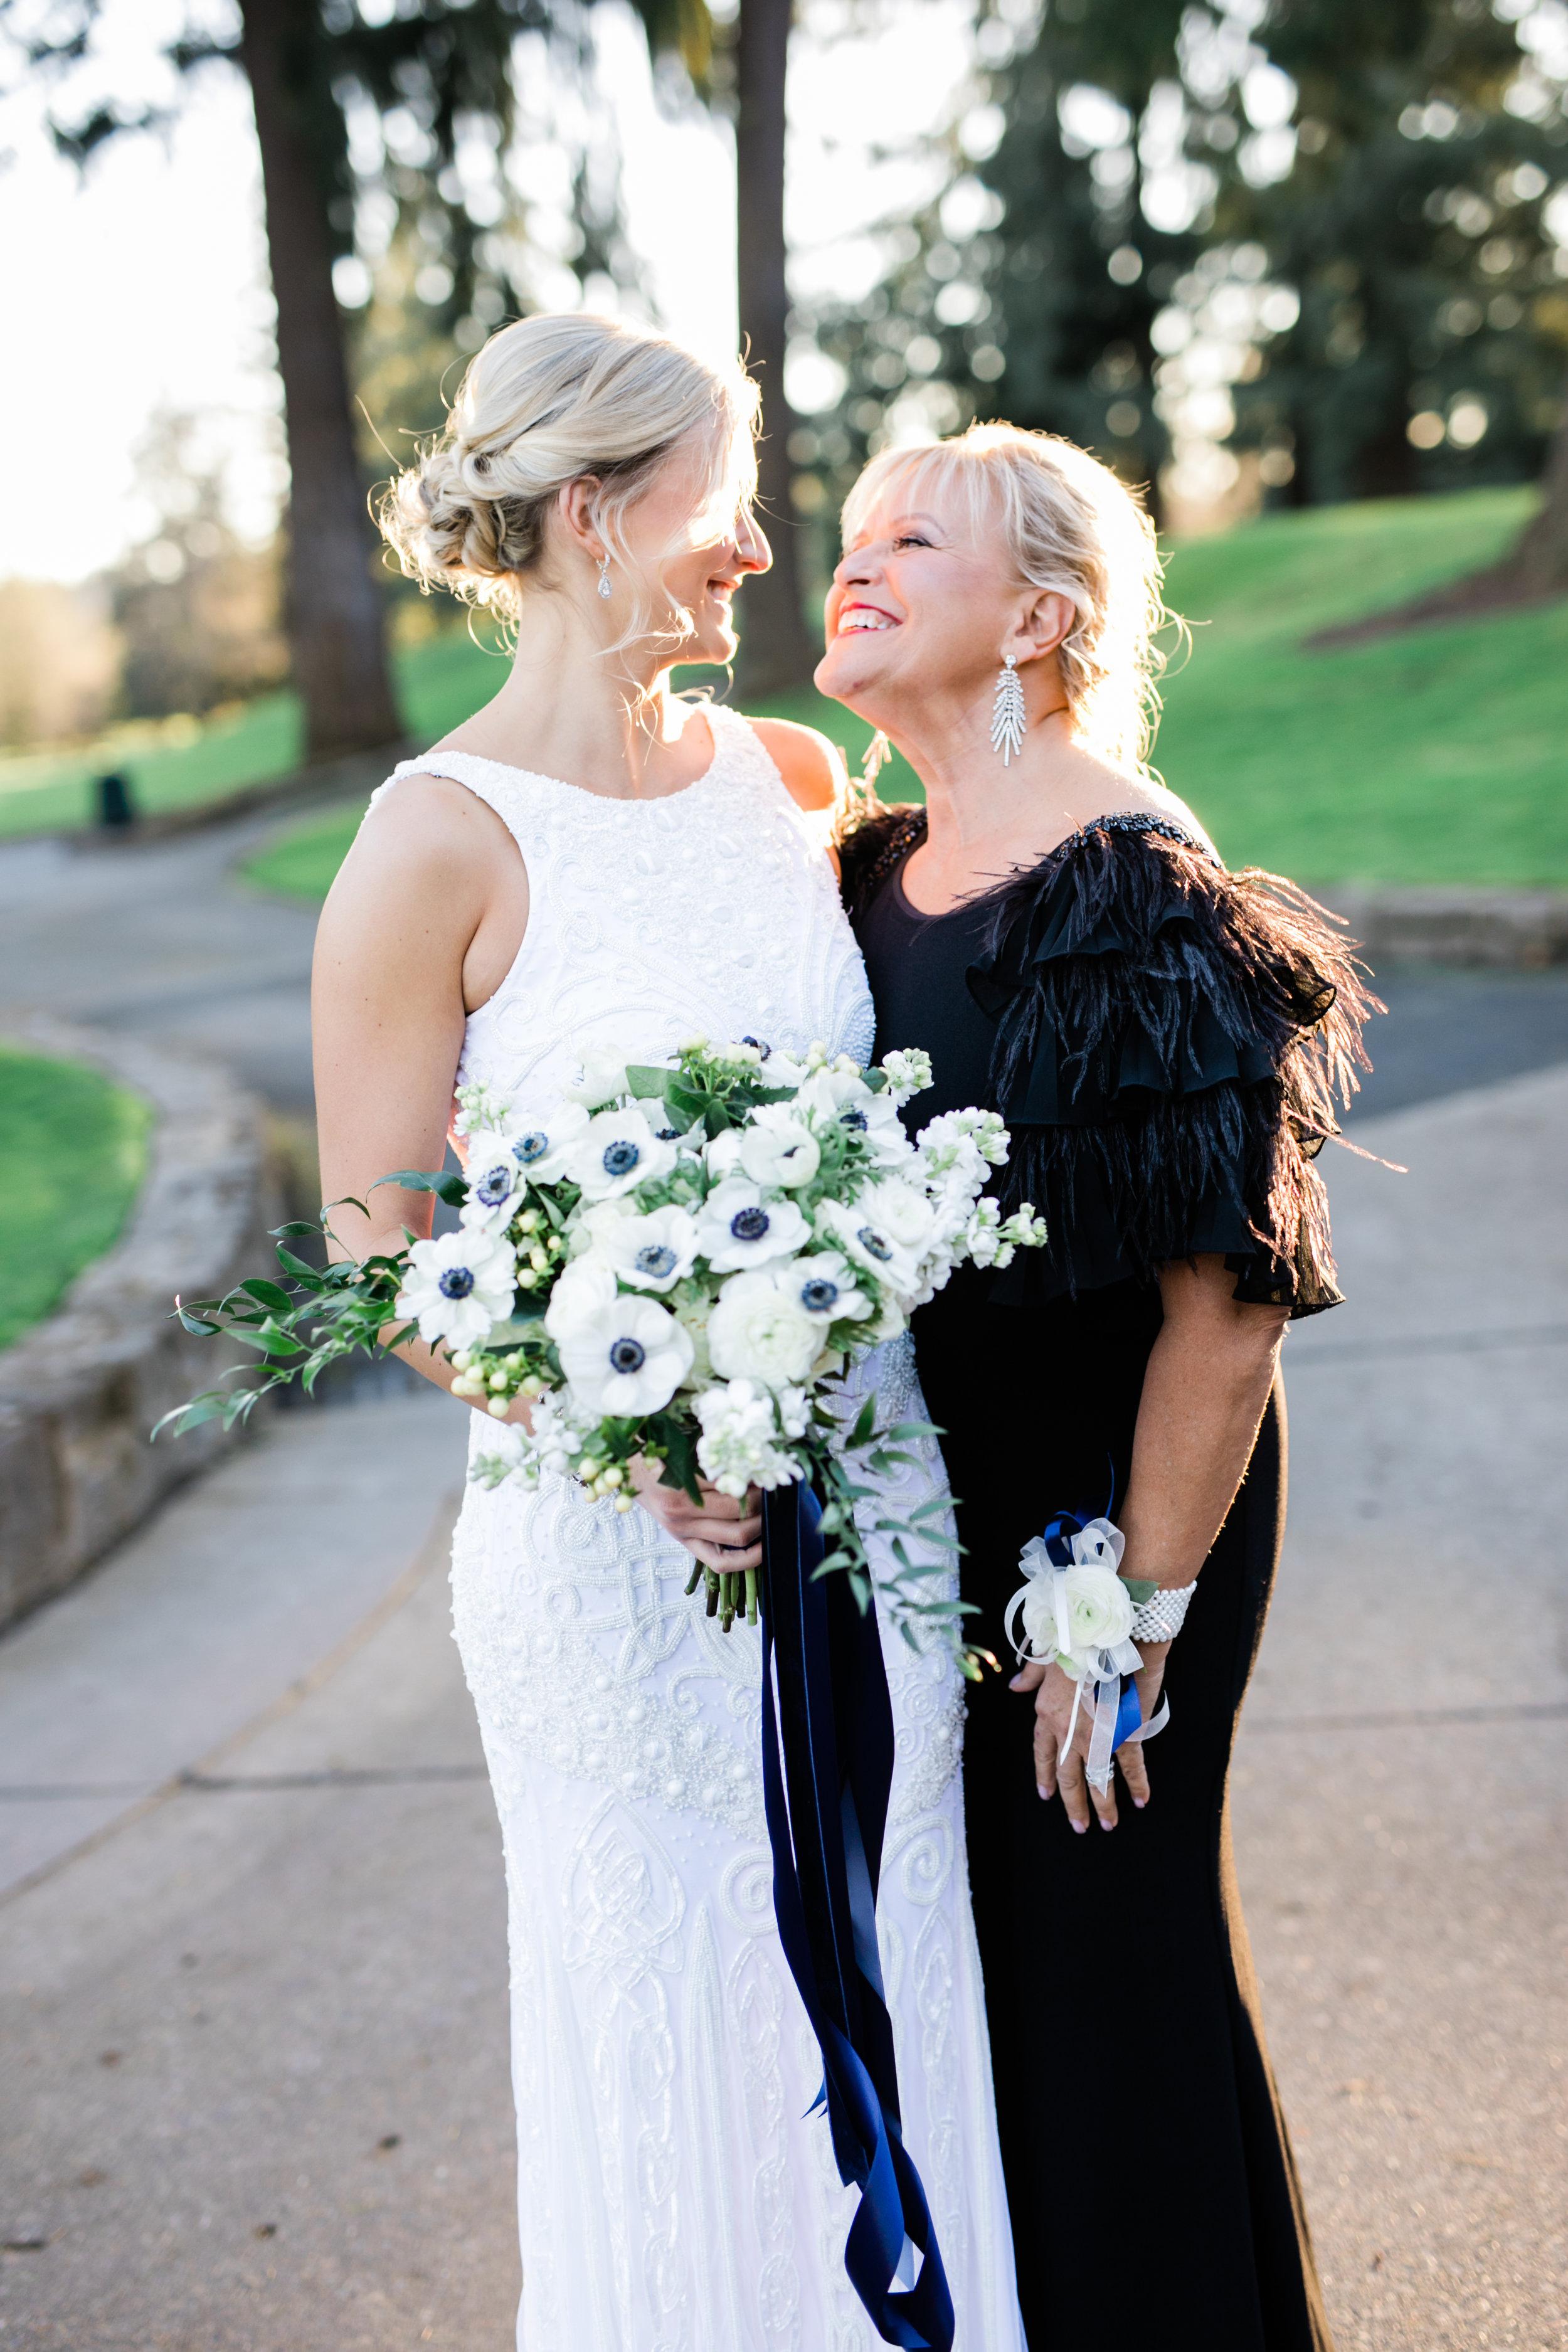 peterson wedding olp 2019-1.jpg